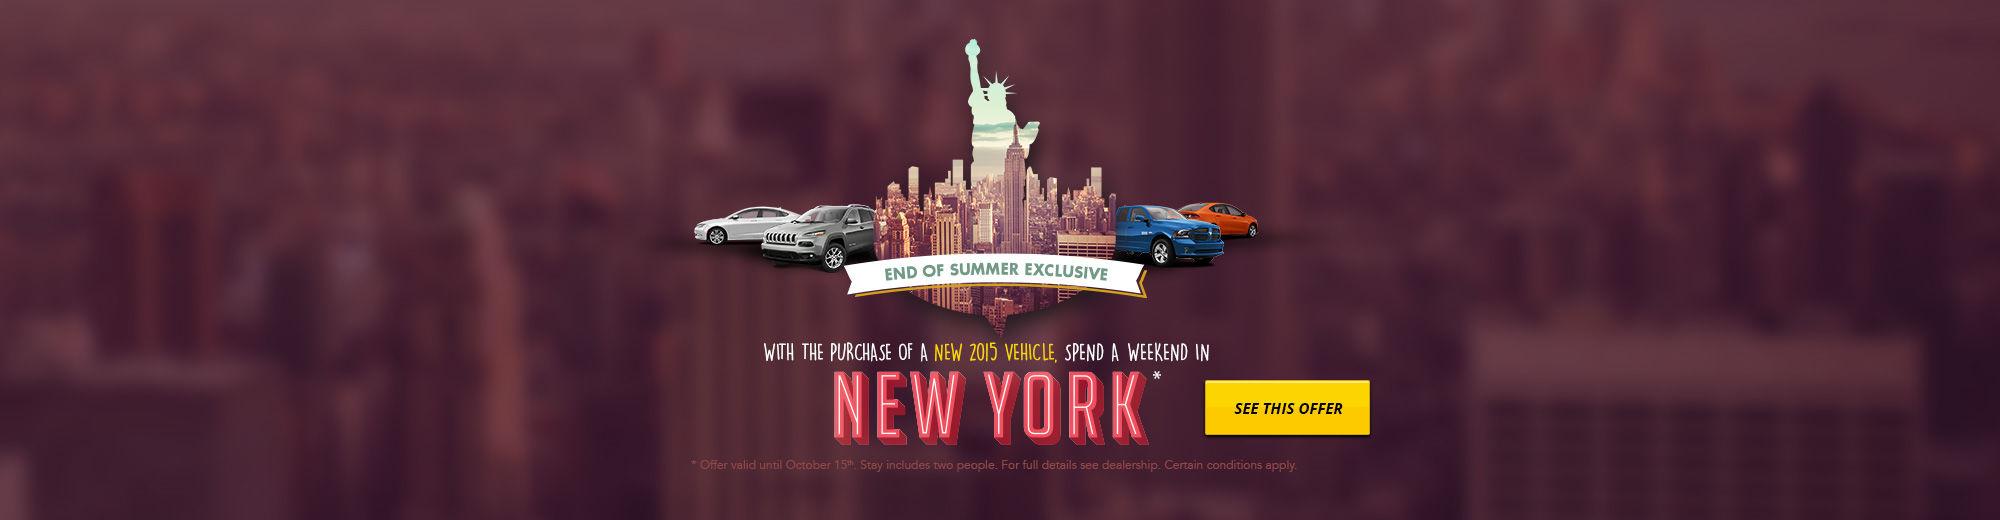 Spendaweekendin New York